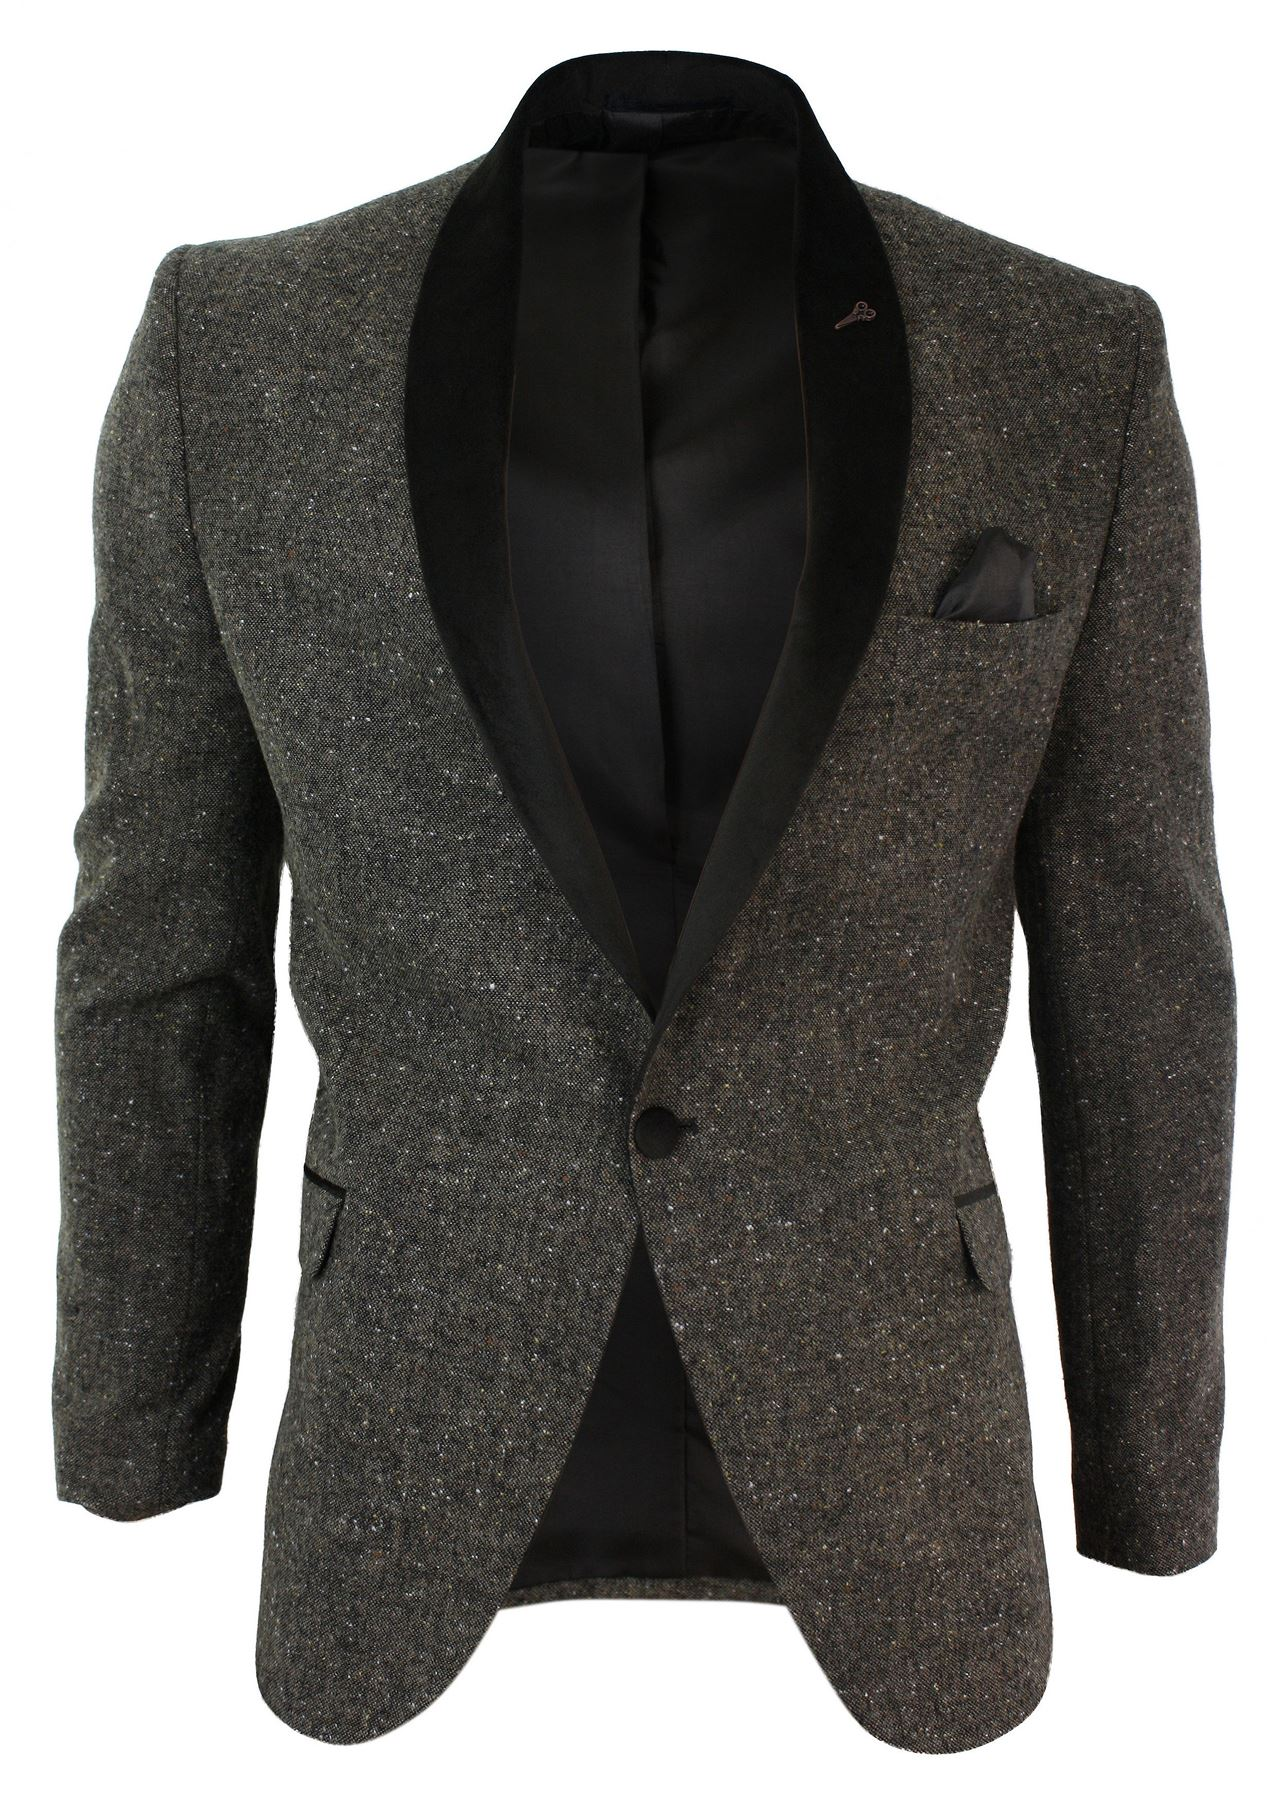 Blazer hommes tweed marron 1 bouton revers velours noir - Blazer homme marron ...